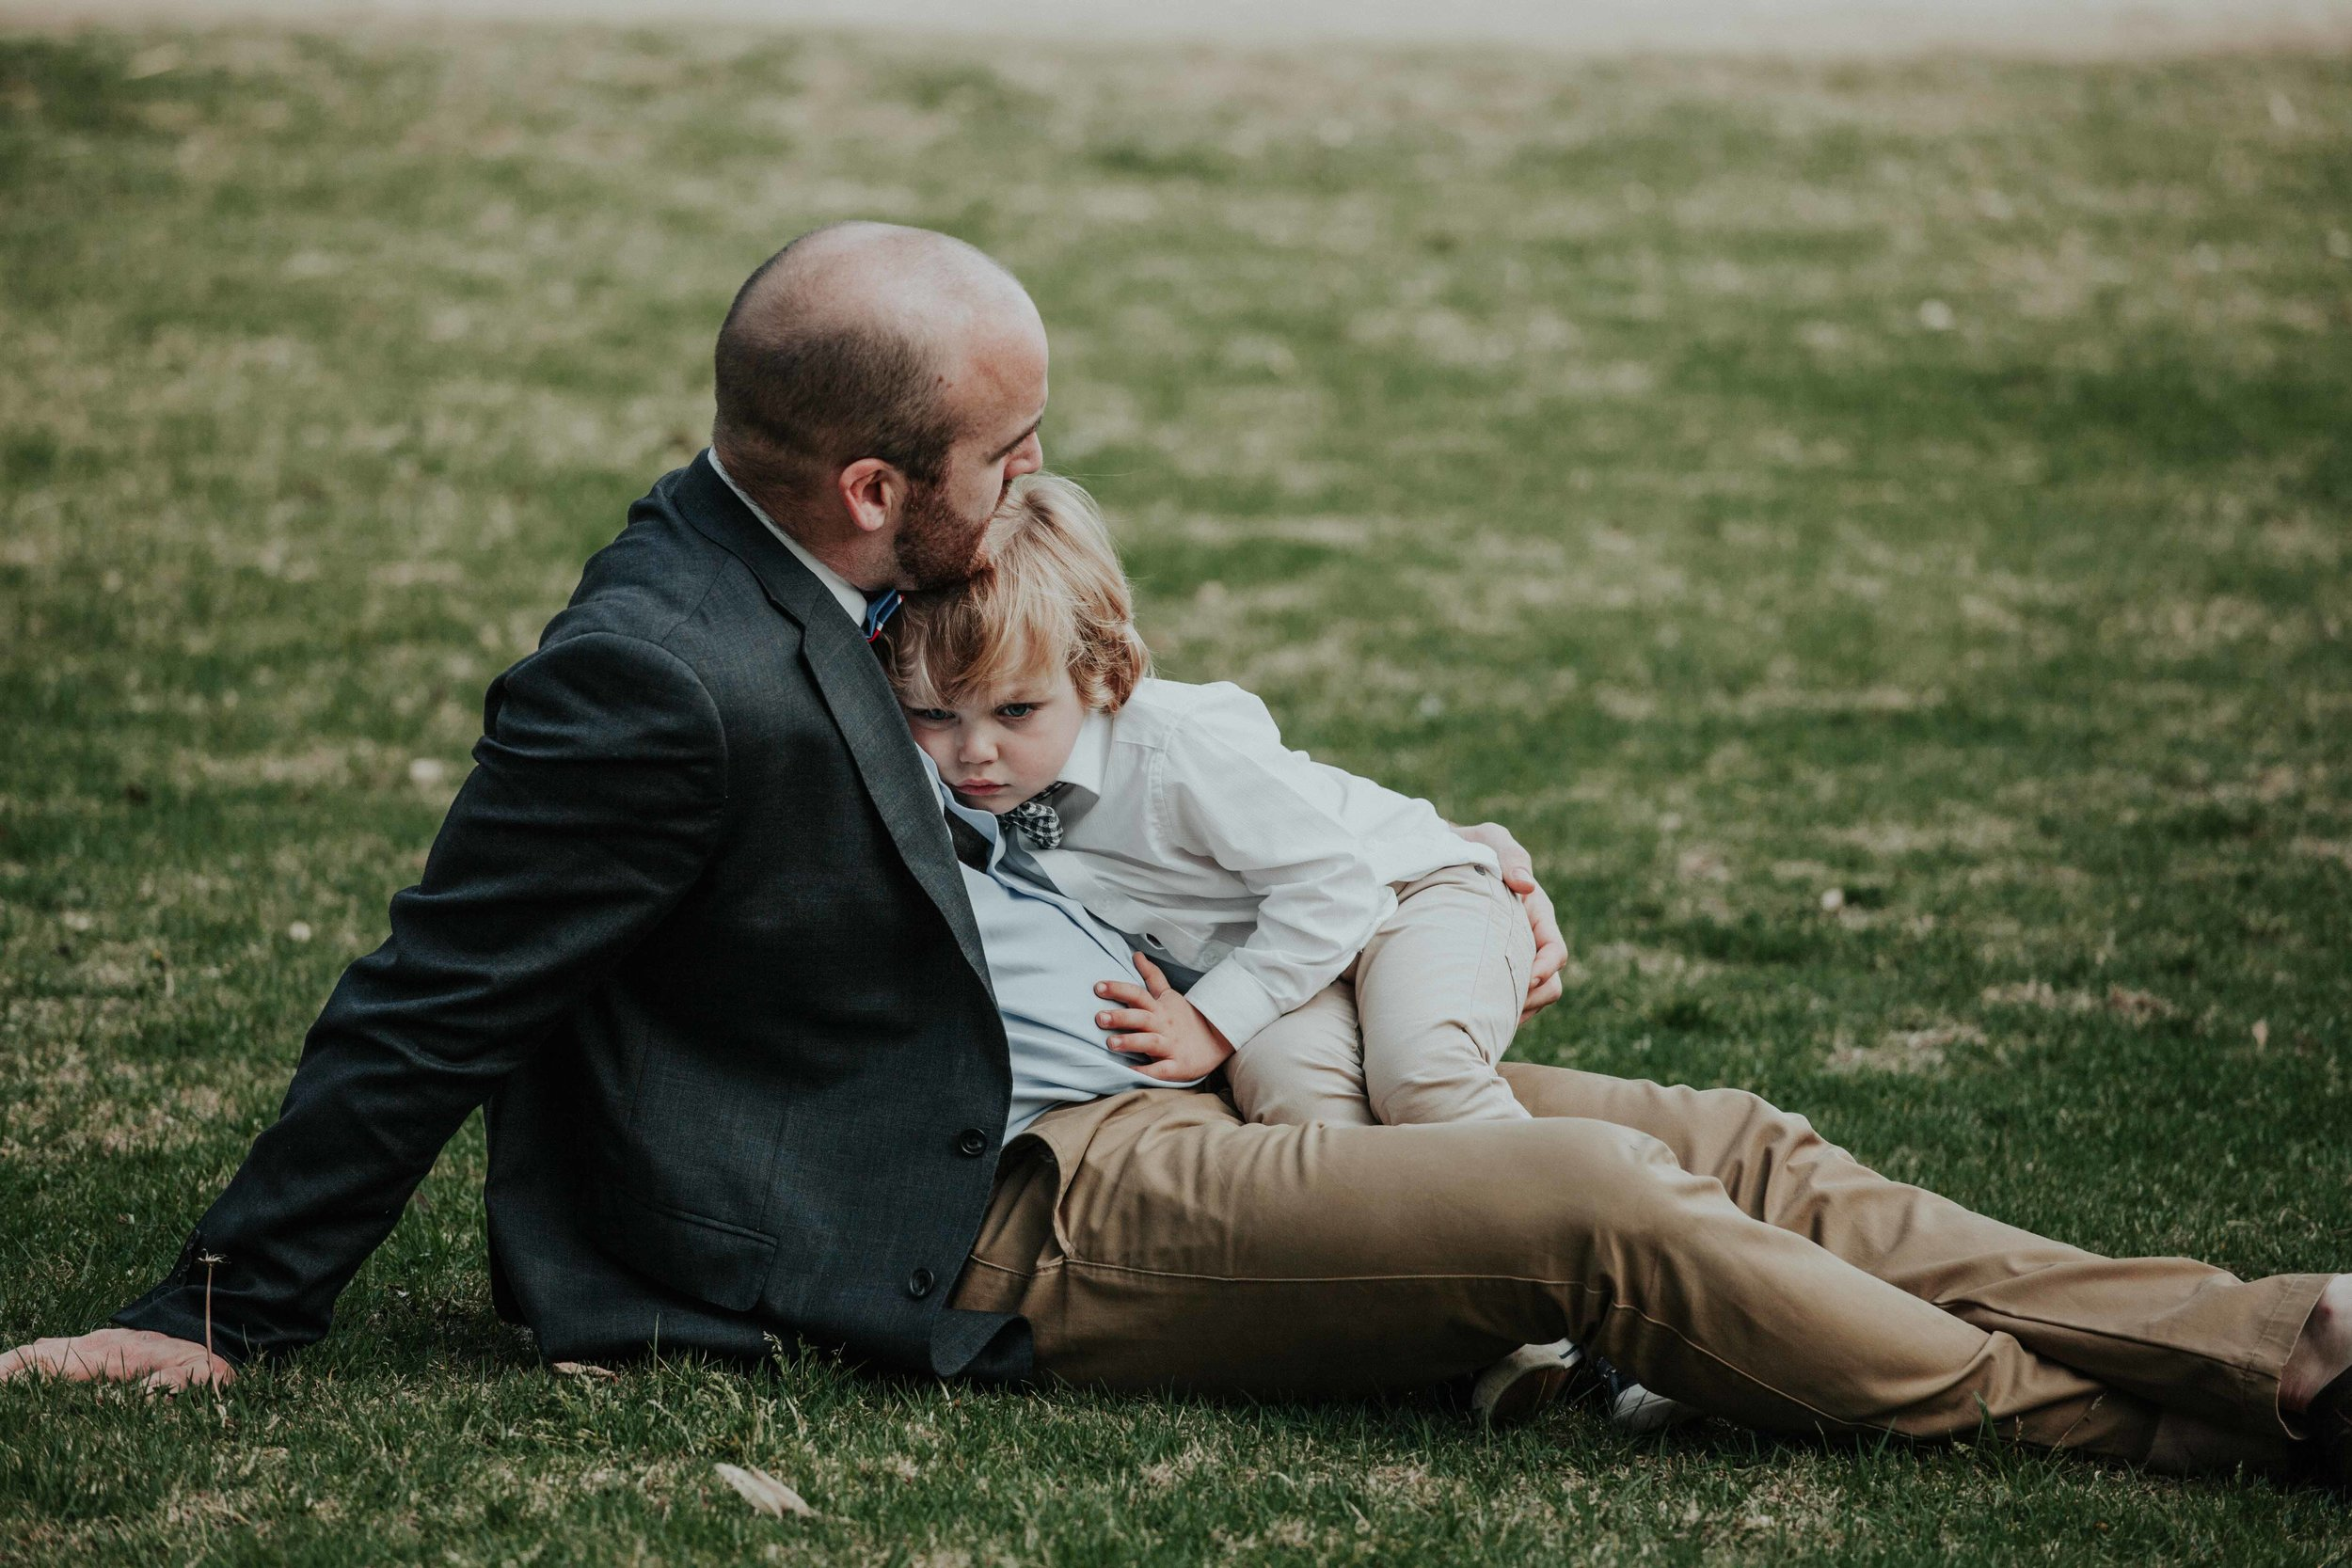 Kristi Smith Photography - Wedding Photographer - Kev and Kirst 7.jpg